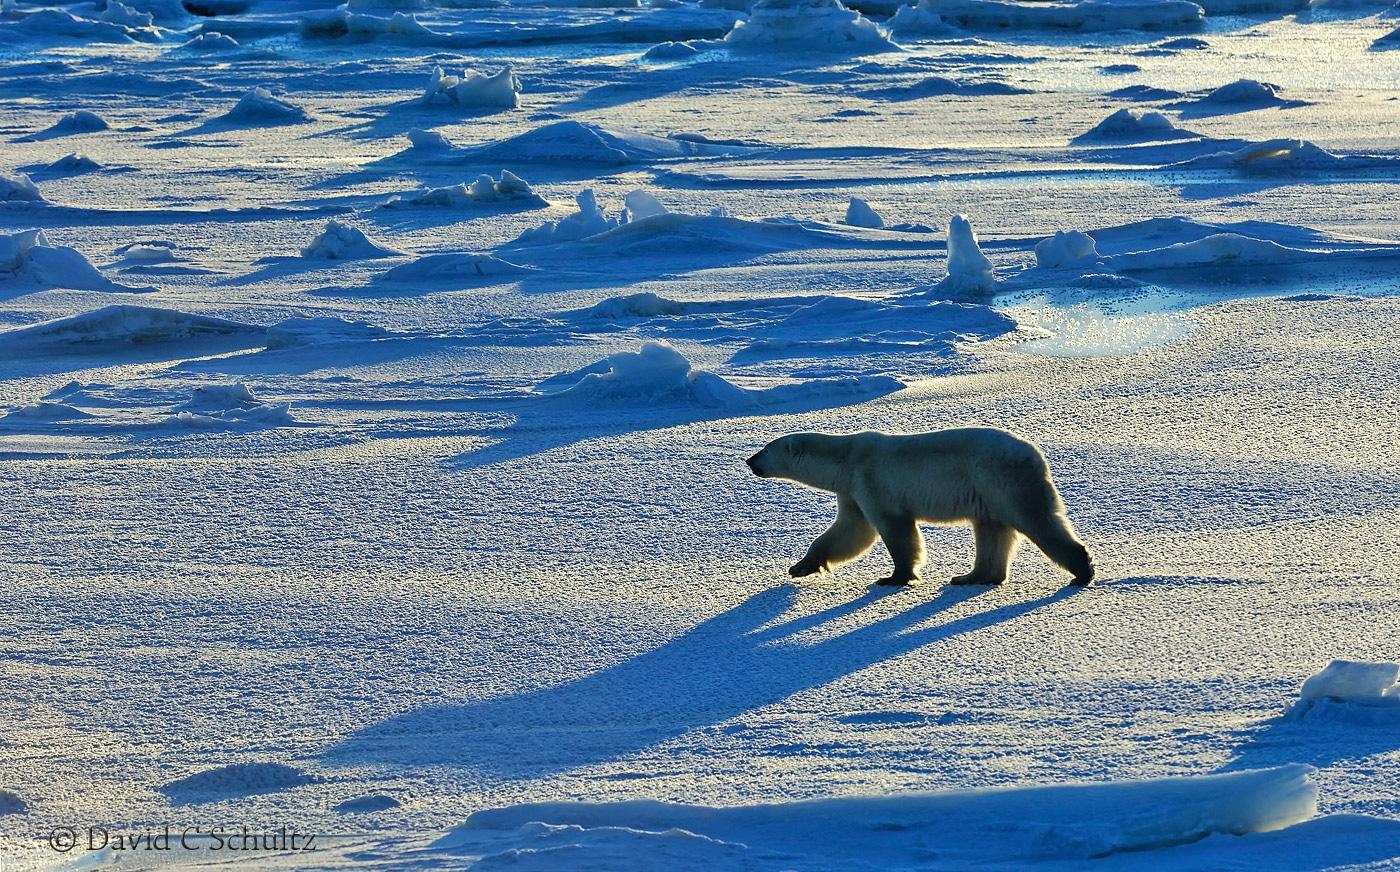 Polar bear, Canada - Image #168-320